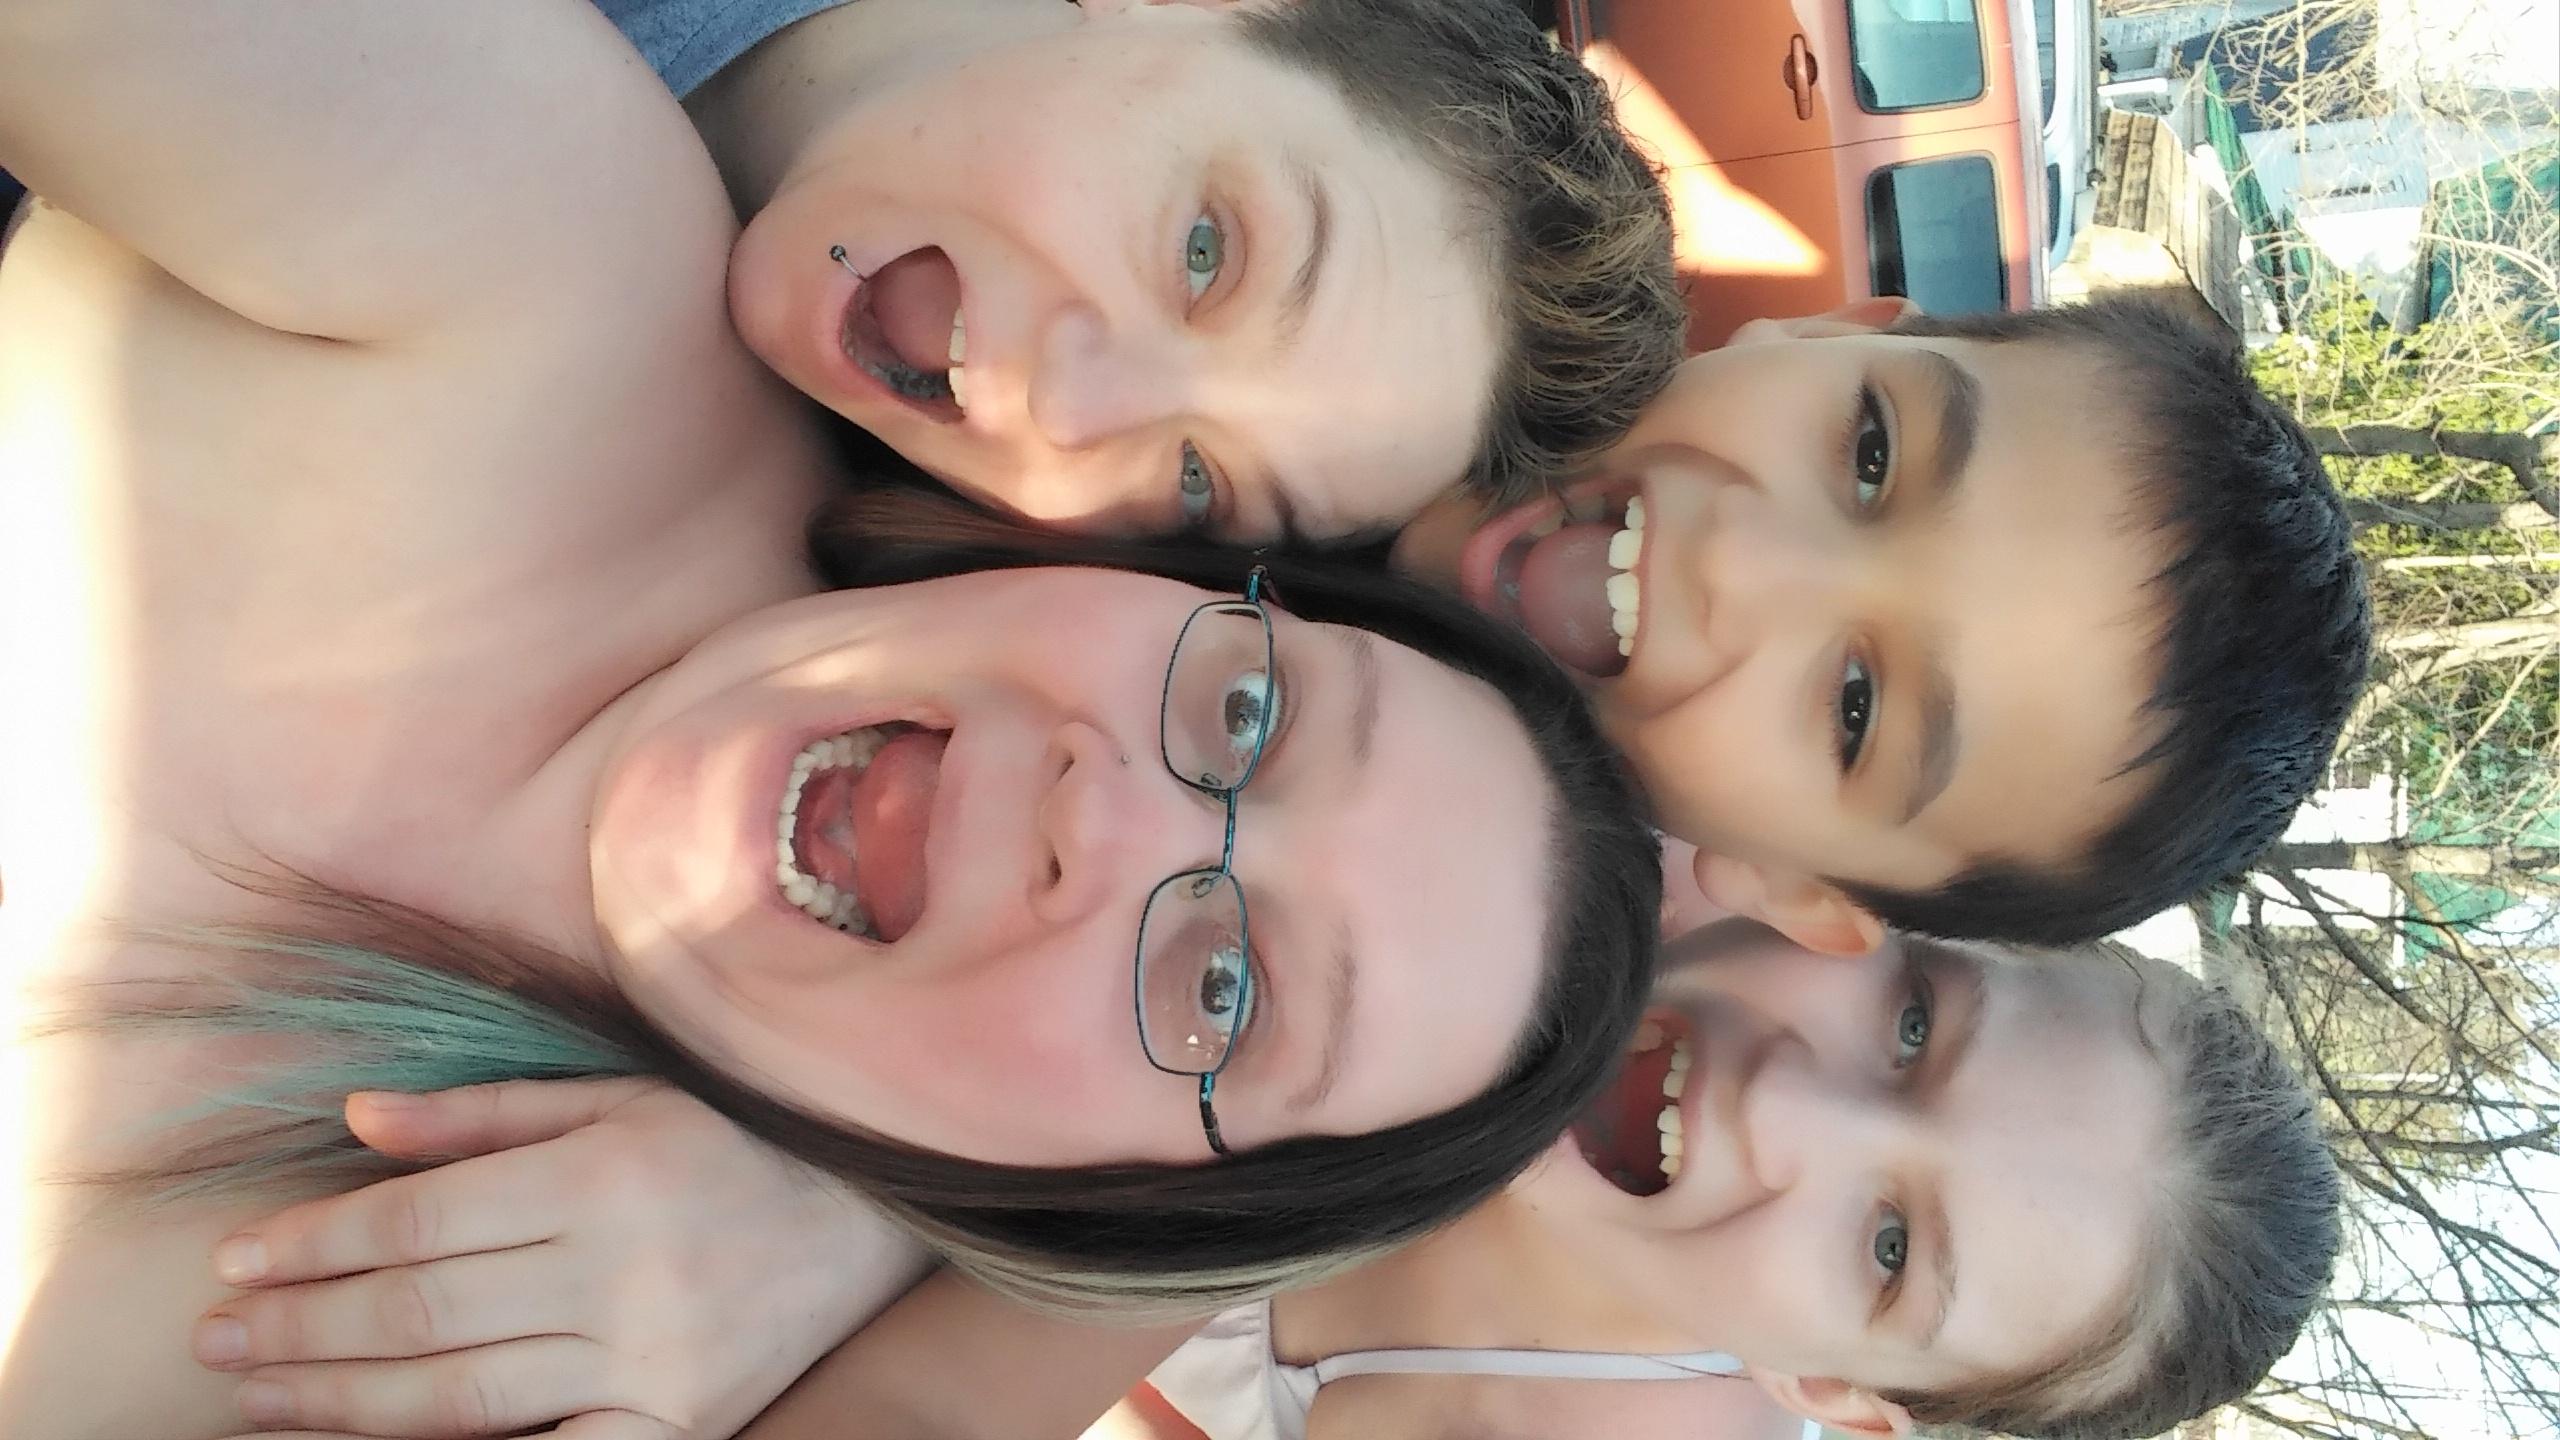 Alicia & Dawn, with Sarah & Matthew